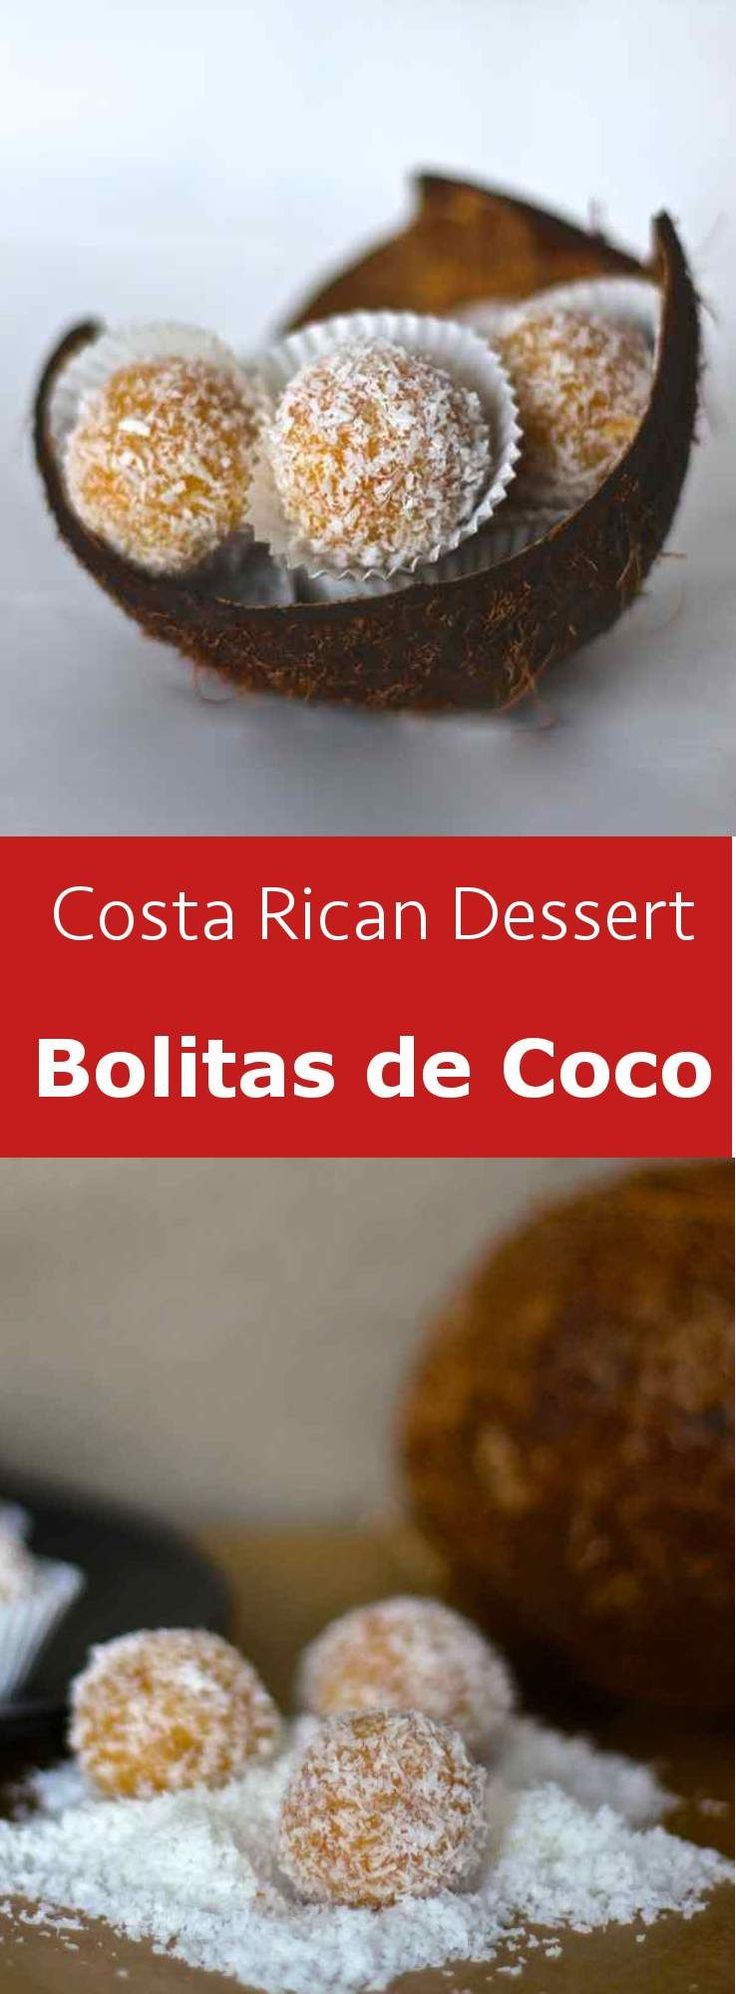 Bolitas de coco Costa Rican